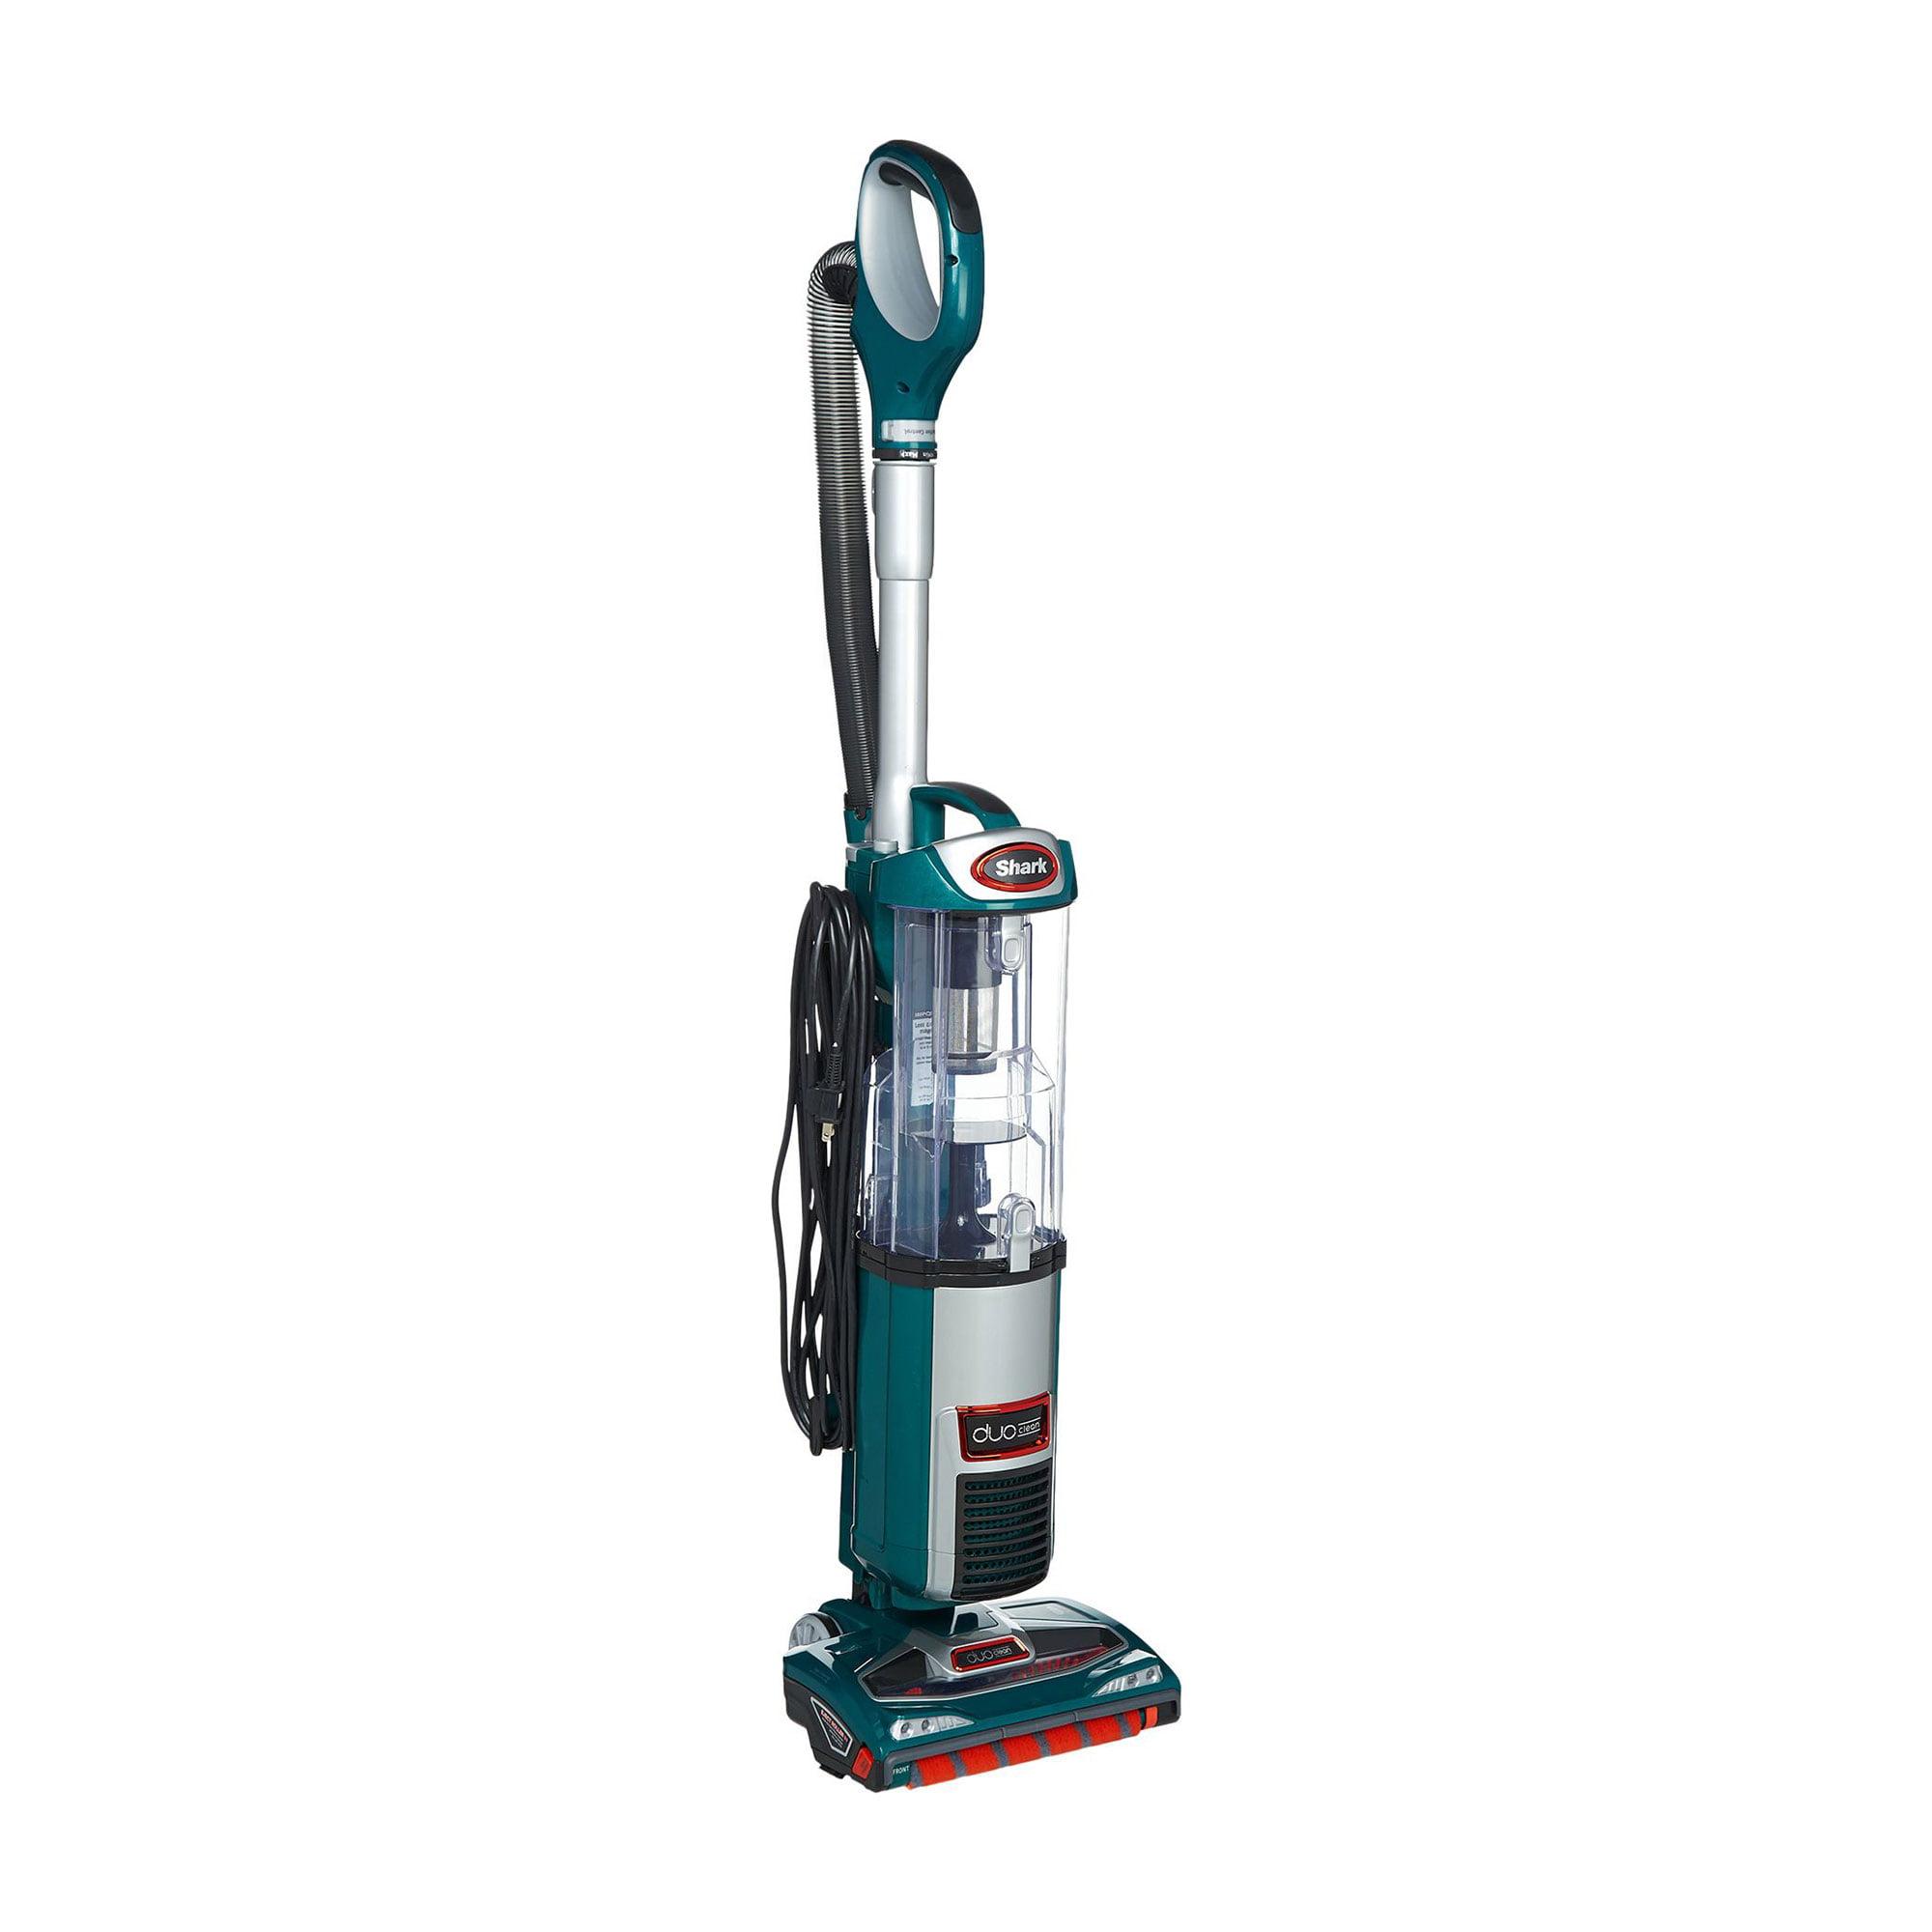 Shark Duoclean Ultra Powerful Slim Upright Vacuum Green